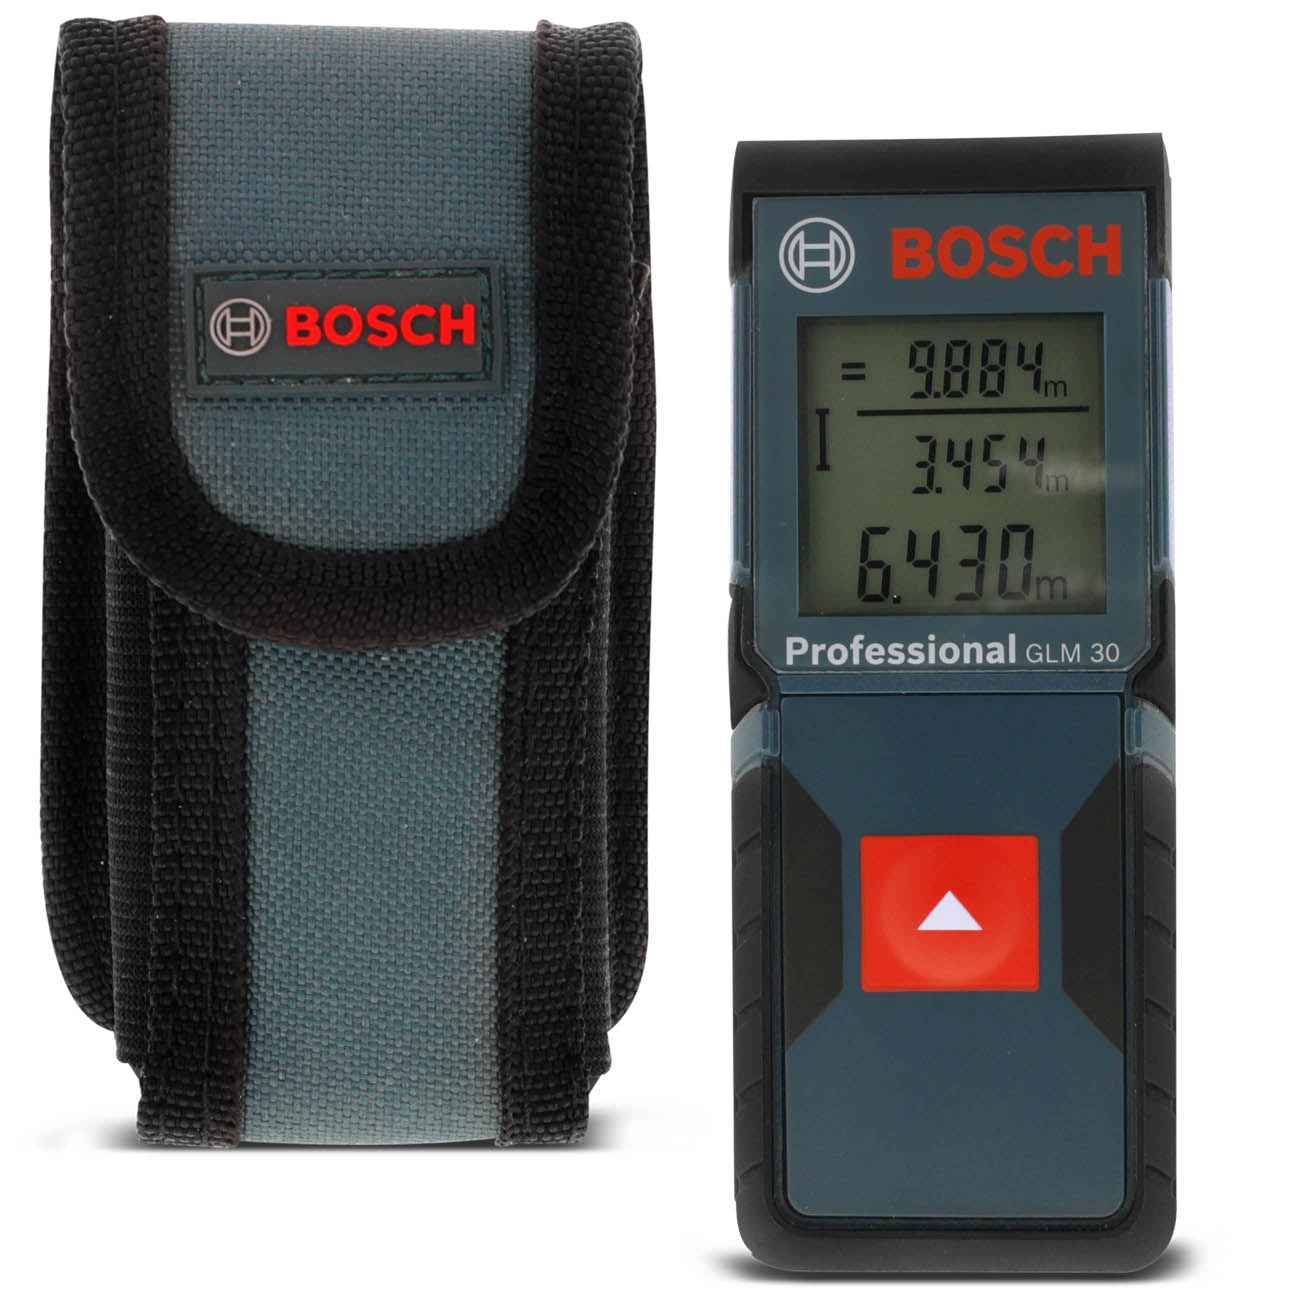 Medidor Trena A Laser 30 Metros Glm30 Profissional Bosch